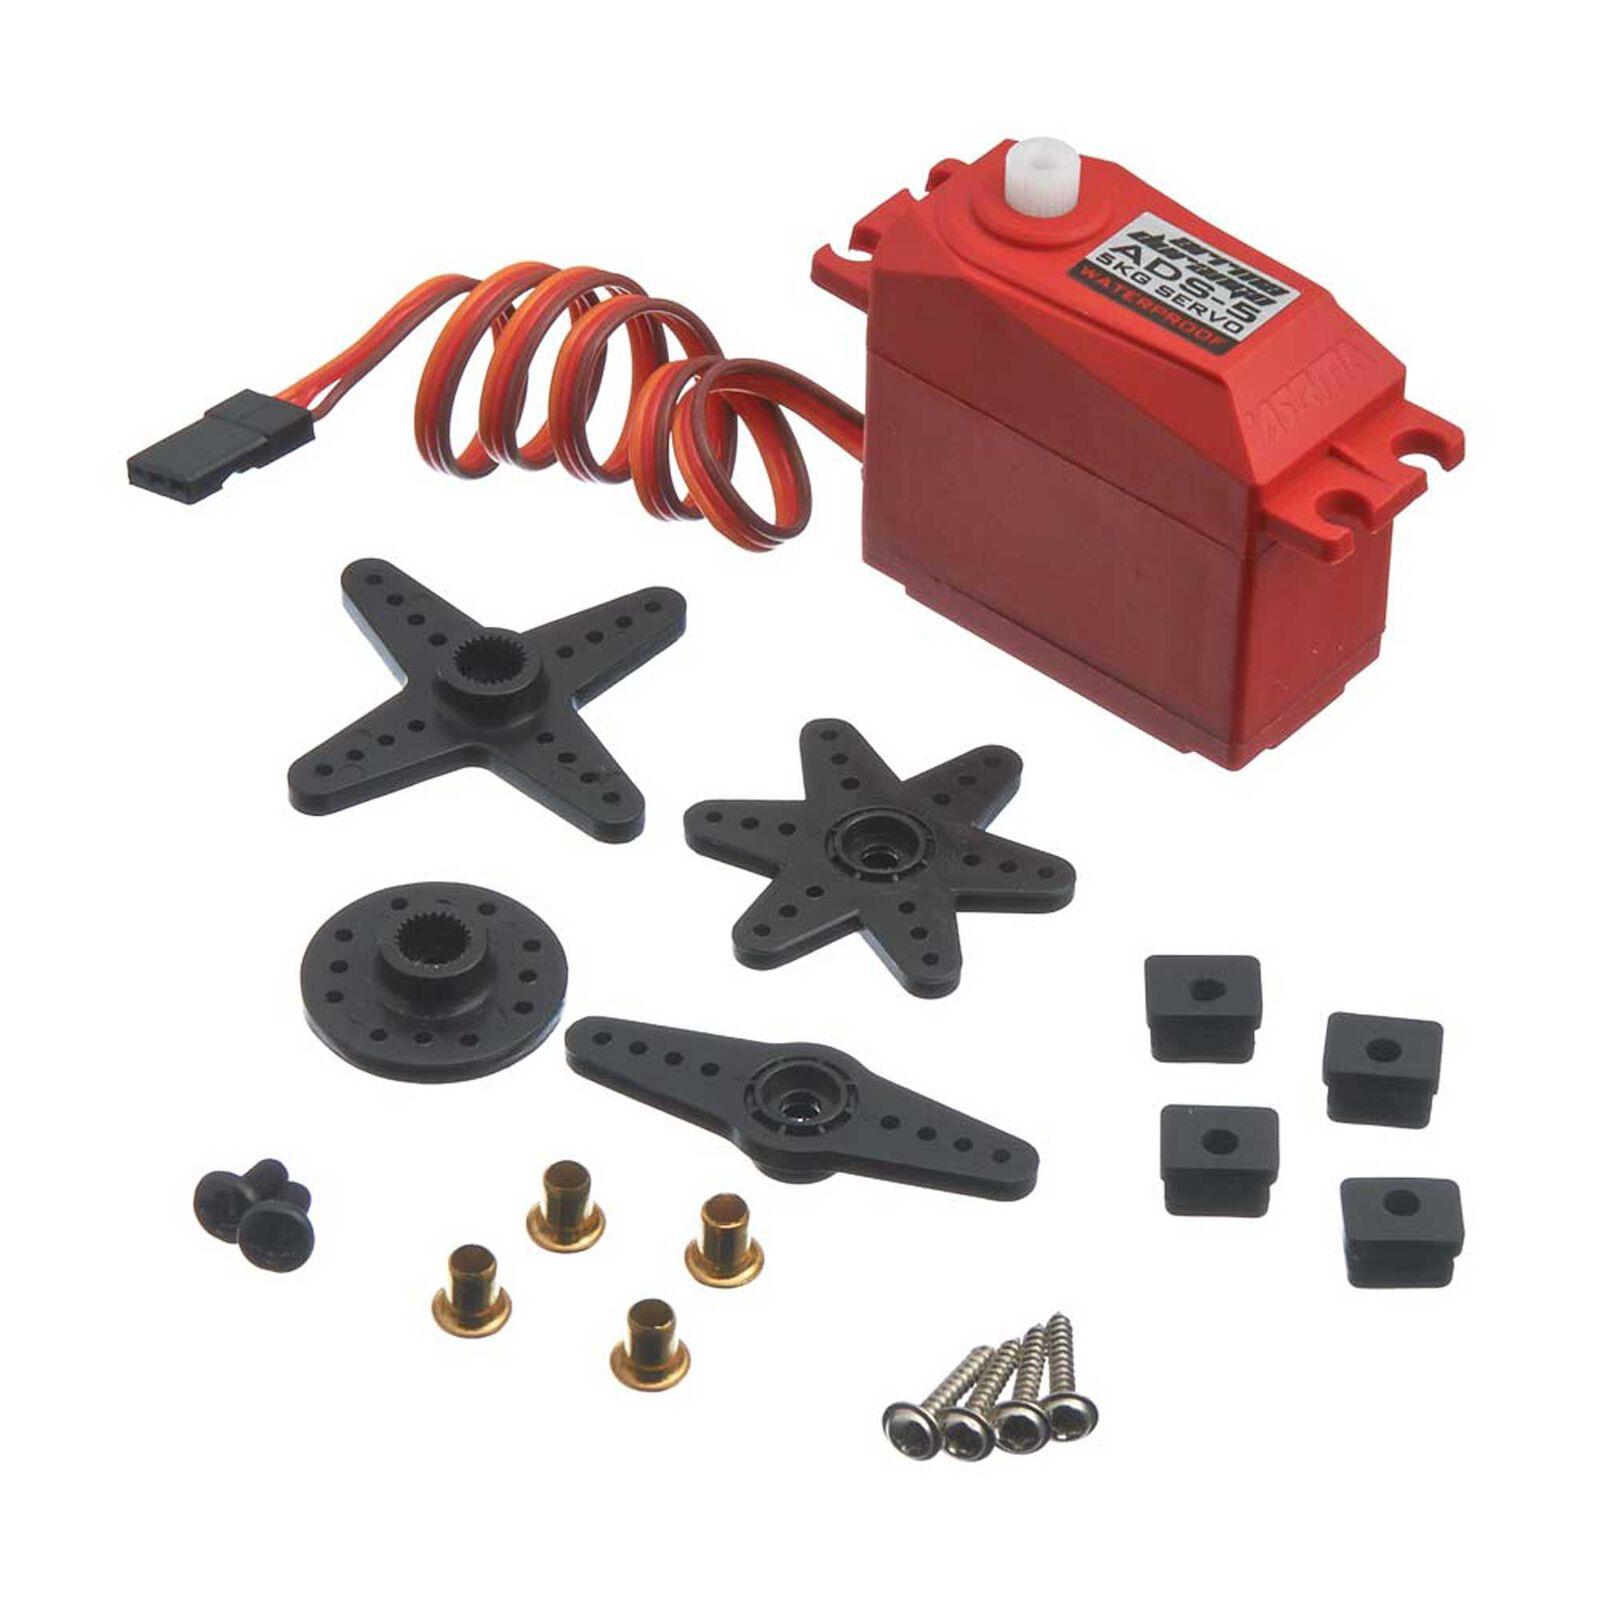 ADS-5 V2 4.5kg Waterproof Servo, Red